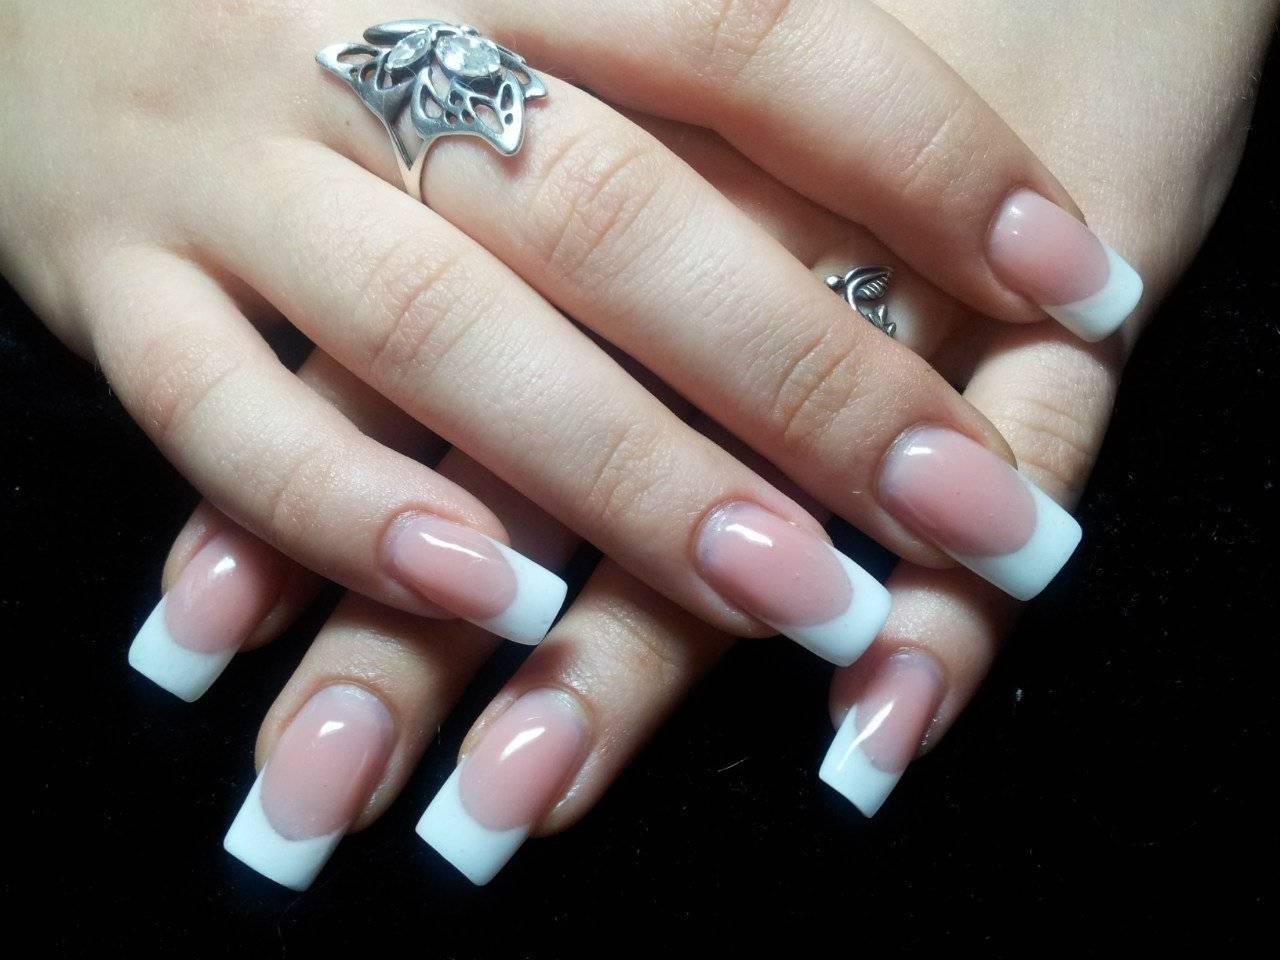 дизайн гелевых ногтей фото: caringmother.ru/443-modelirovanie-i-dizayn-gelevyh-nogtey...